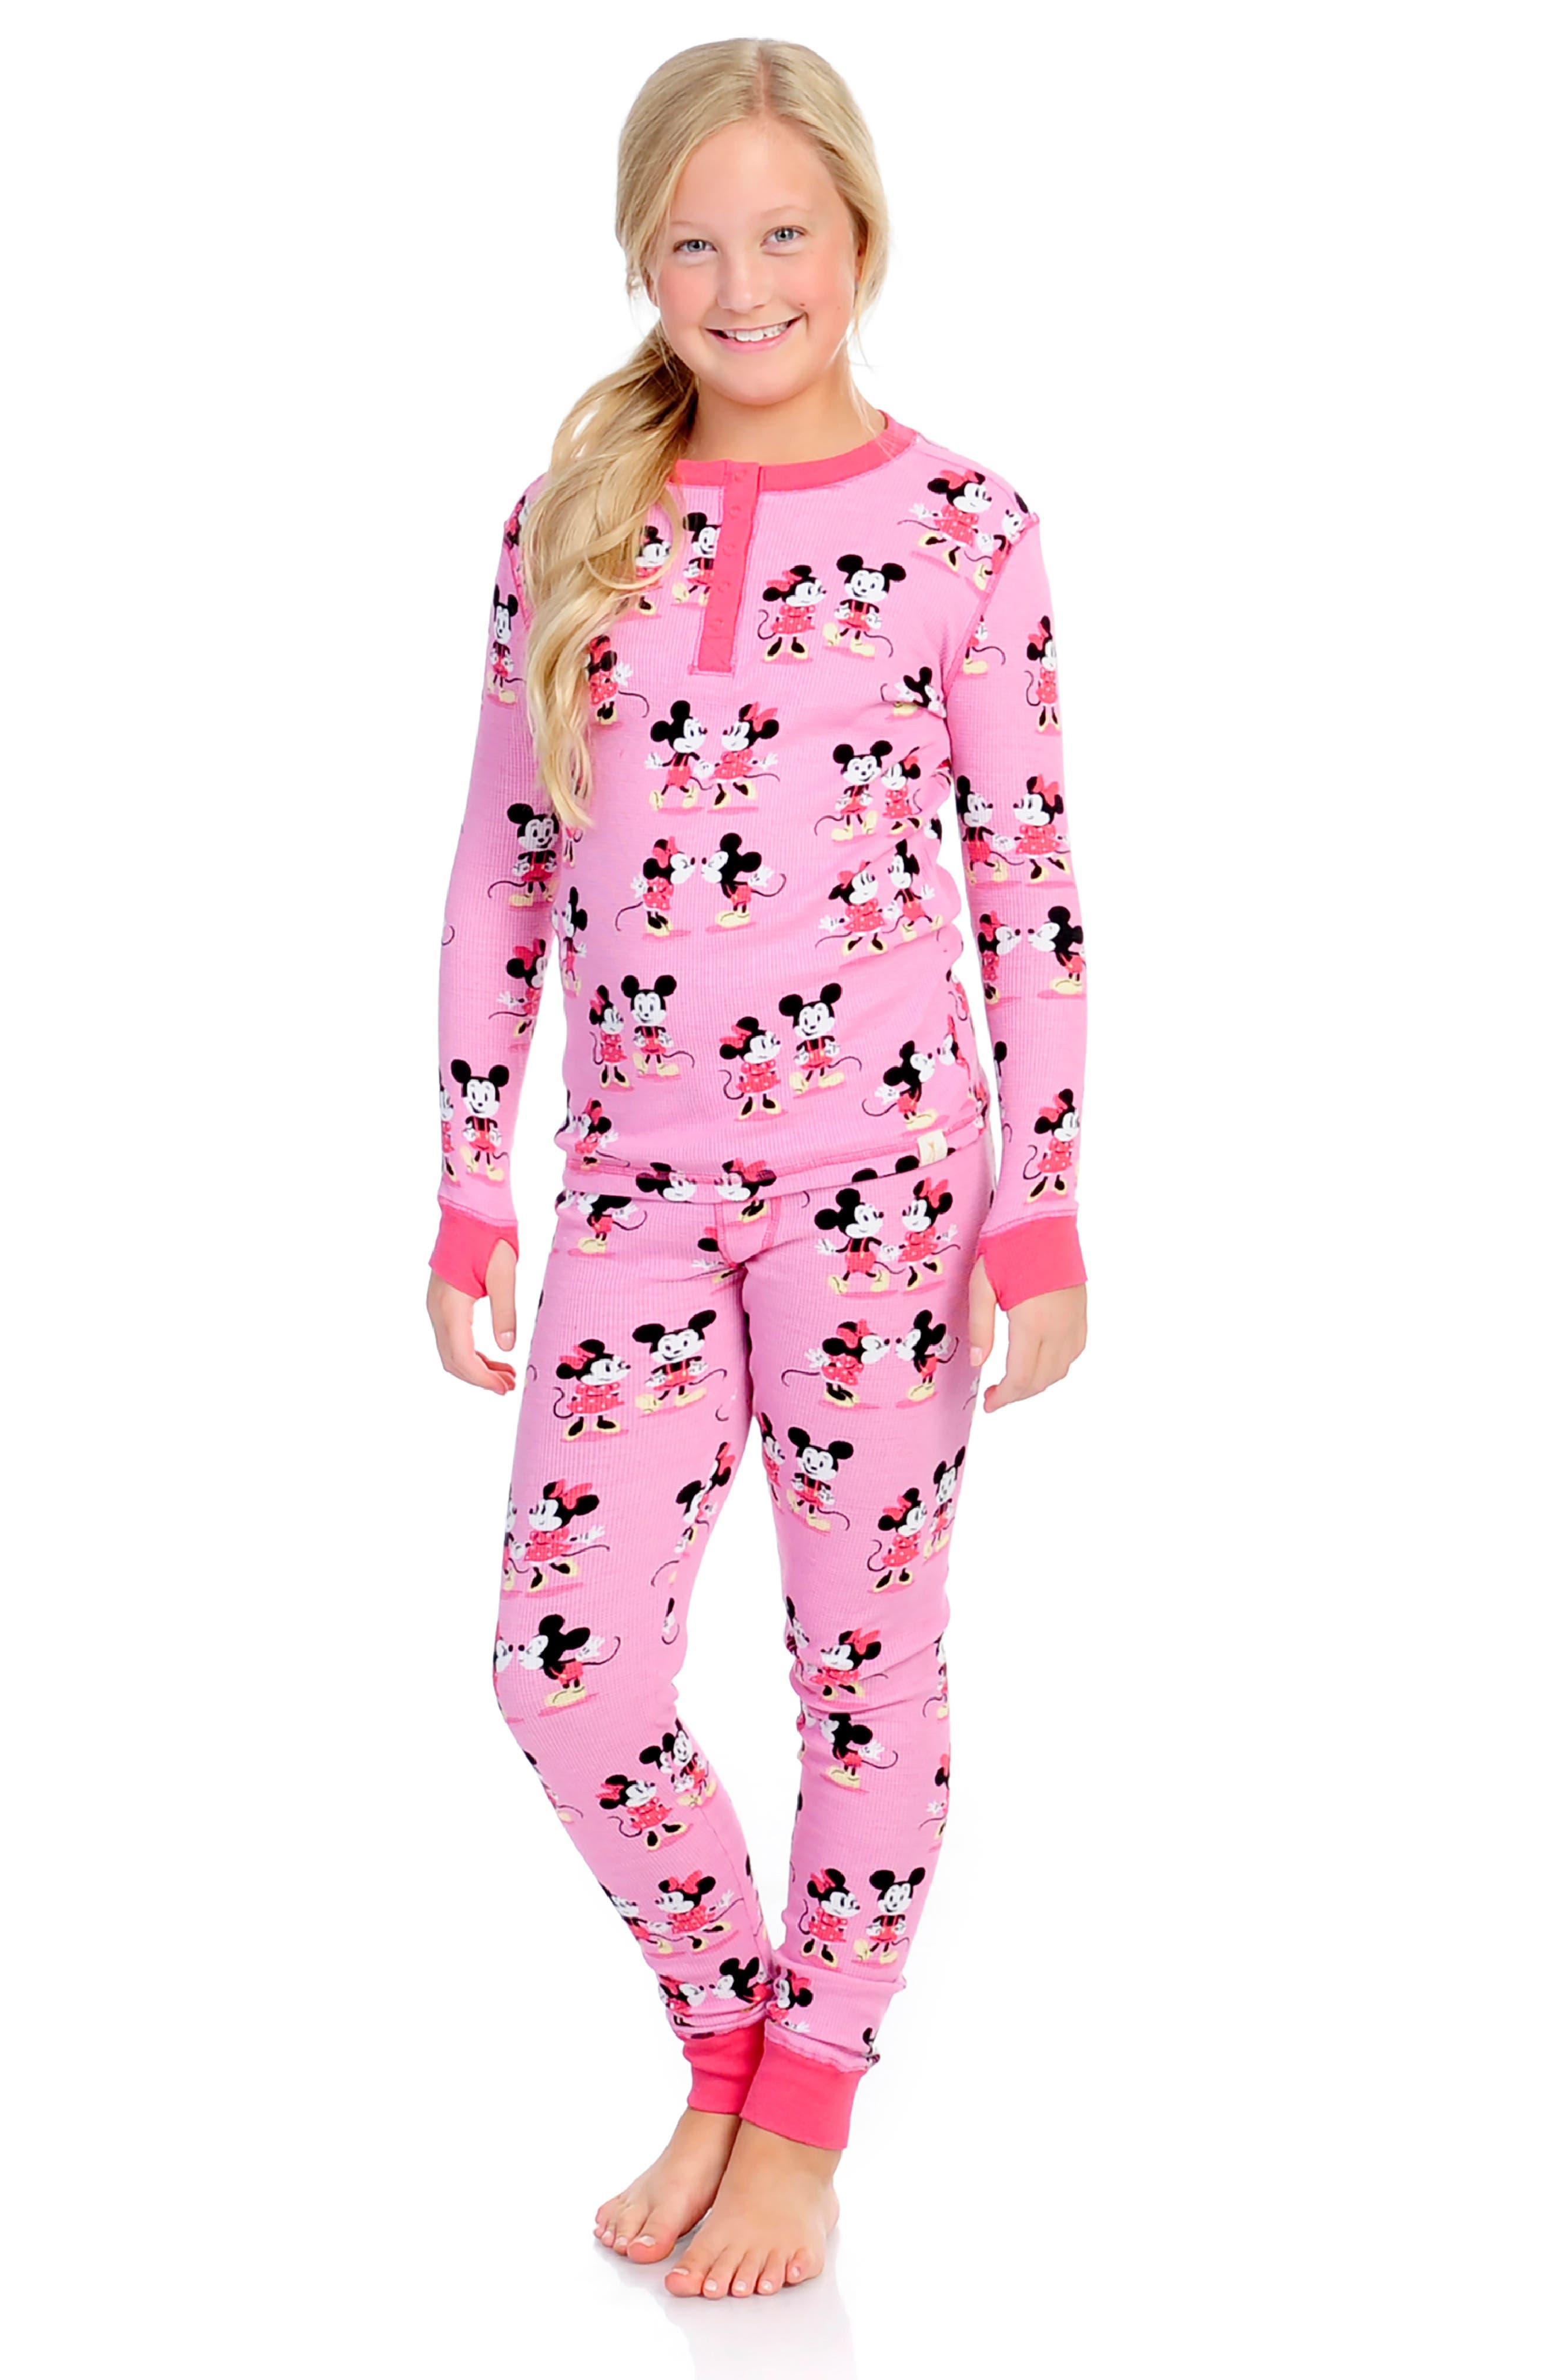 MUNKI MUNKI,                             Minnie Mickey Fitted Two-Piece Pajamas,                             Alternate thumbnail 3, color,                             650